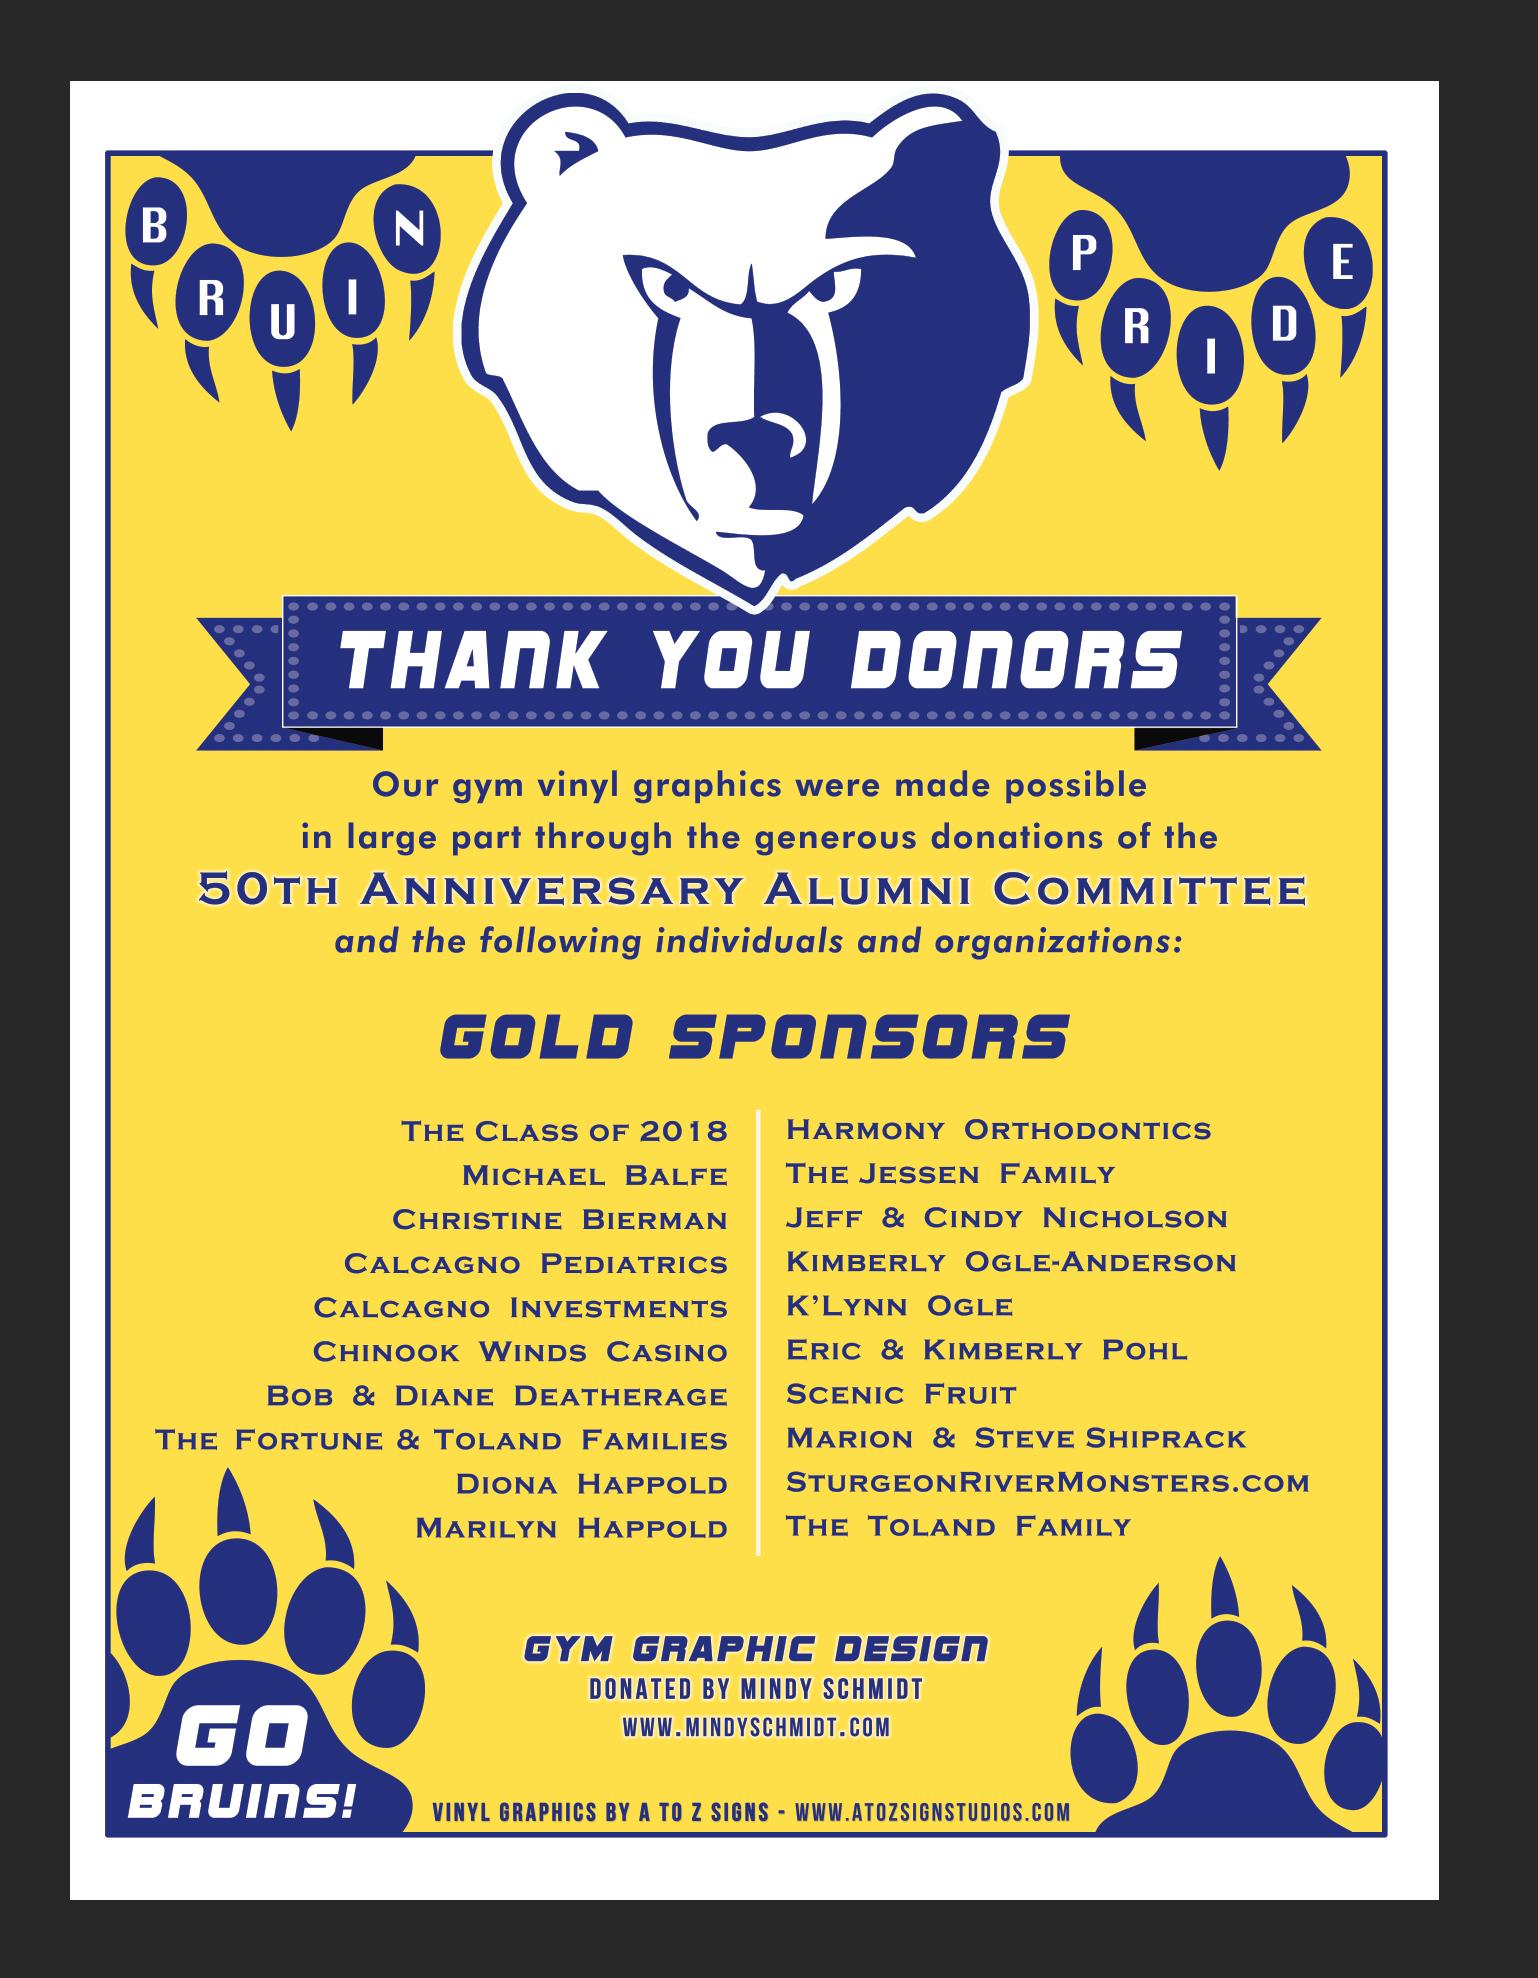 Go Bruins! – Mindy Schmidt Imaging Services